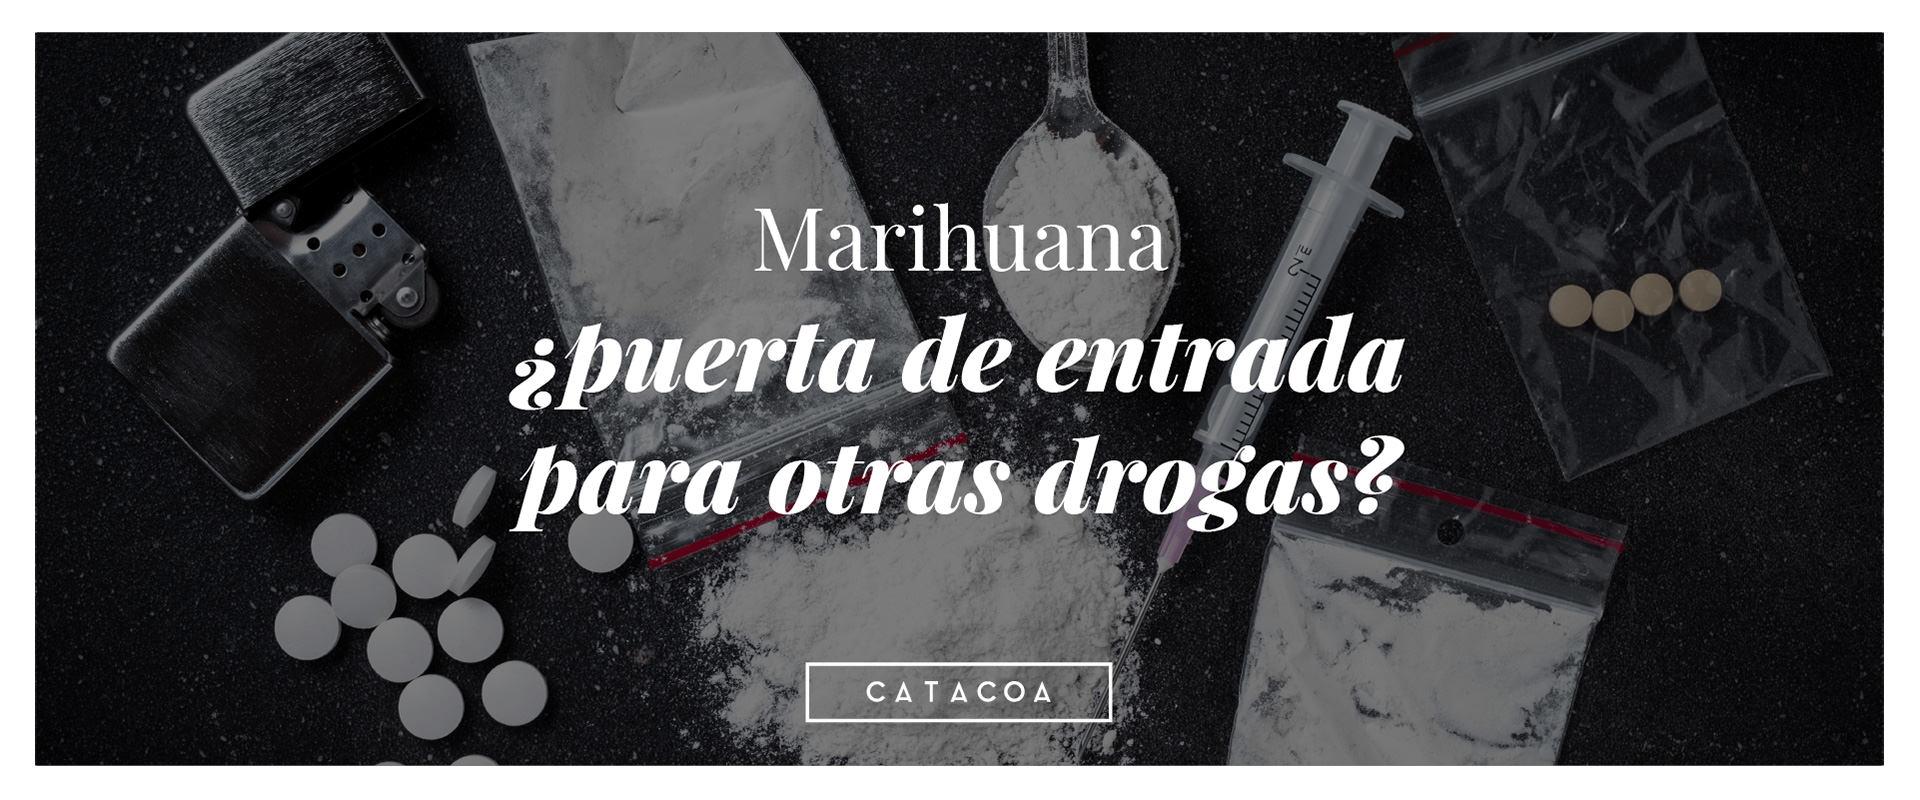 La marihuana no es la puerta de entrada a otras drogas